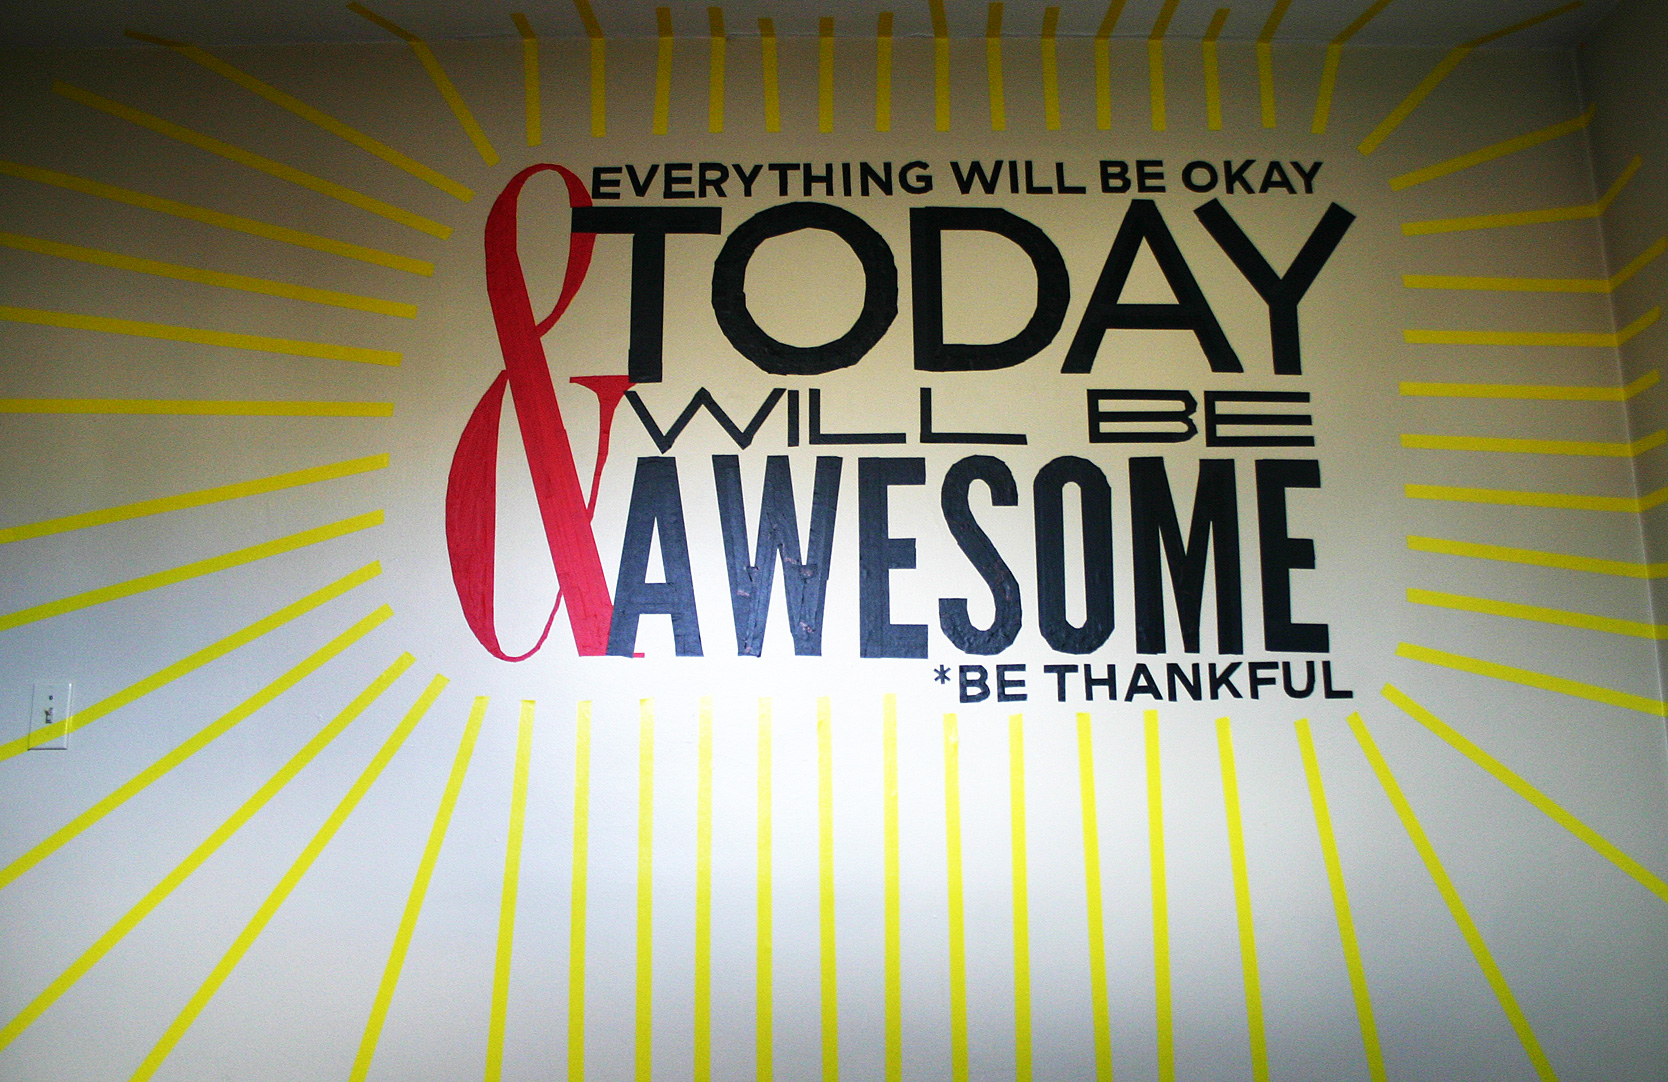 TodayWillBeAwesome.jpg